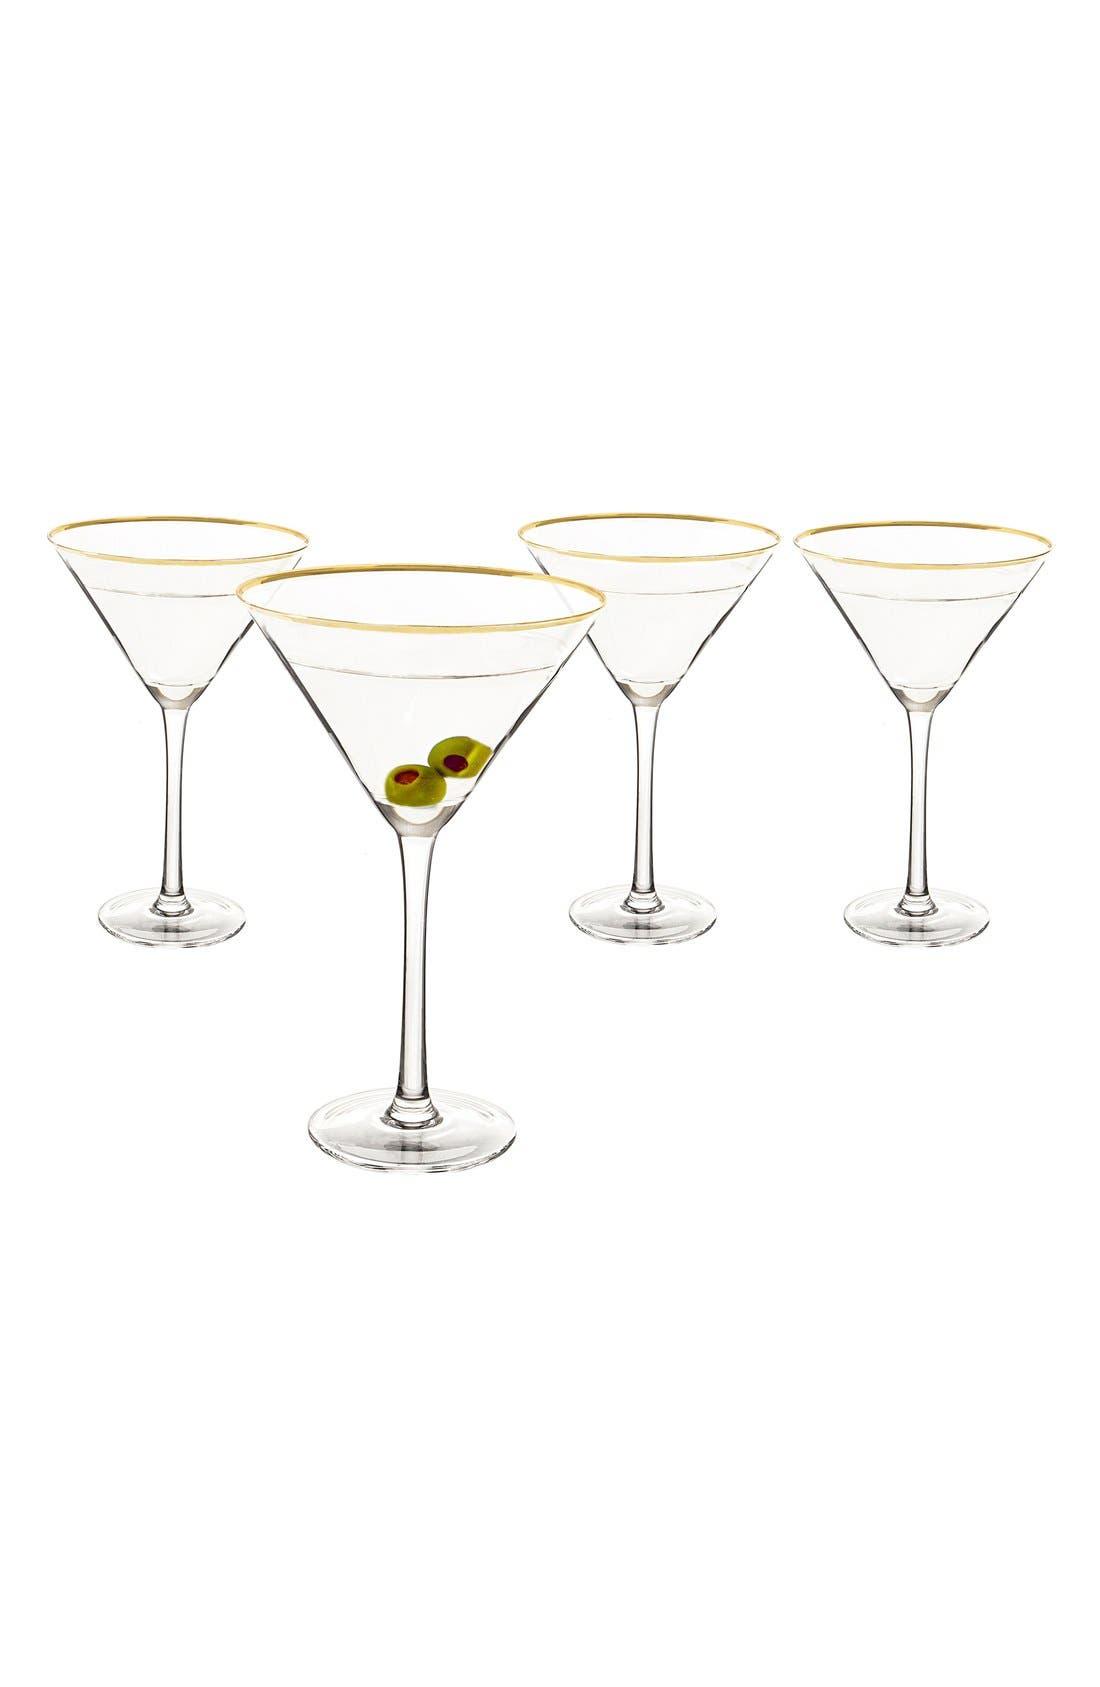 Set of 4 Gold Rimmed Monogram Martini Glasses,                             Main thumbnail 1, color,                             710